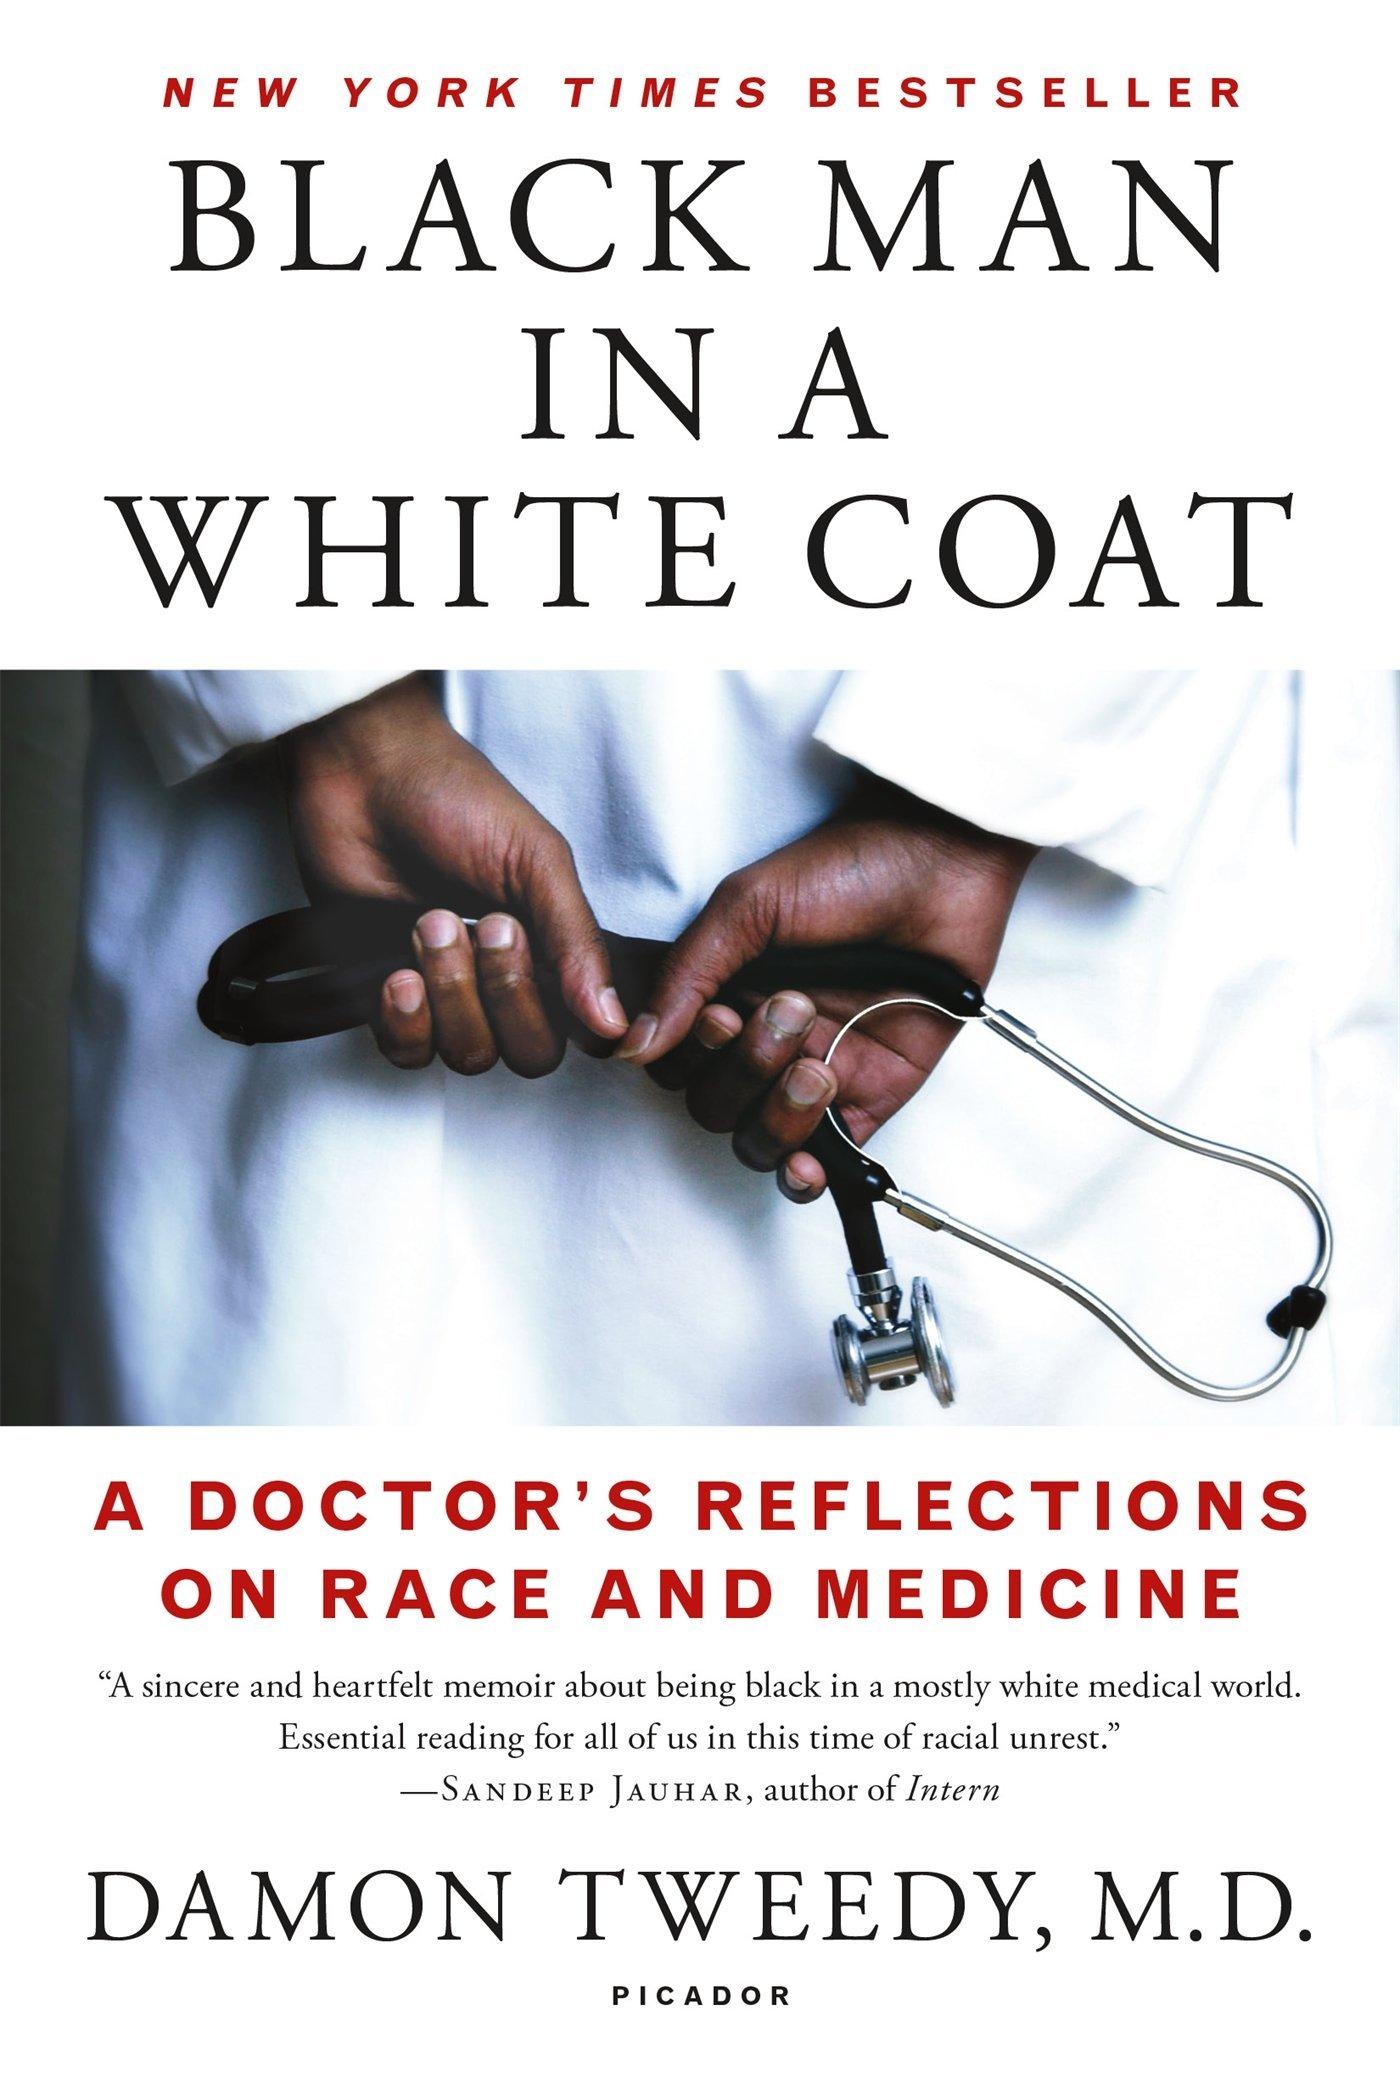 Black Man in a White Coat, by Dr. Damon Tweedy